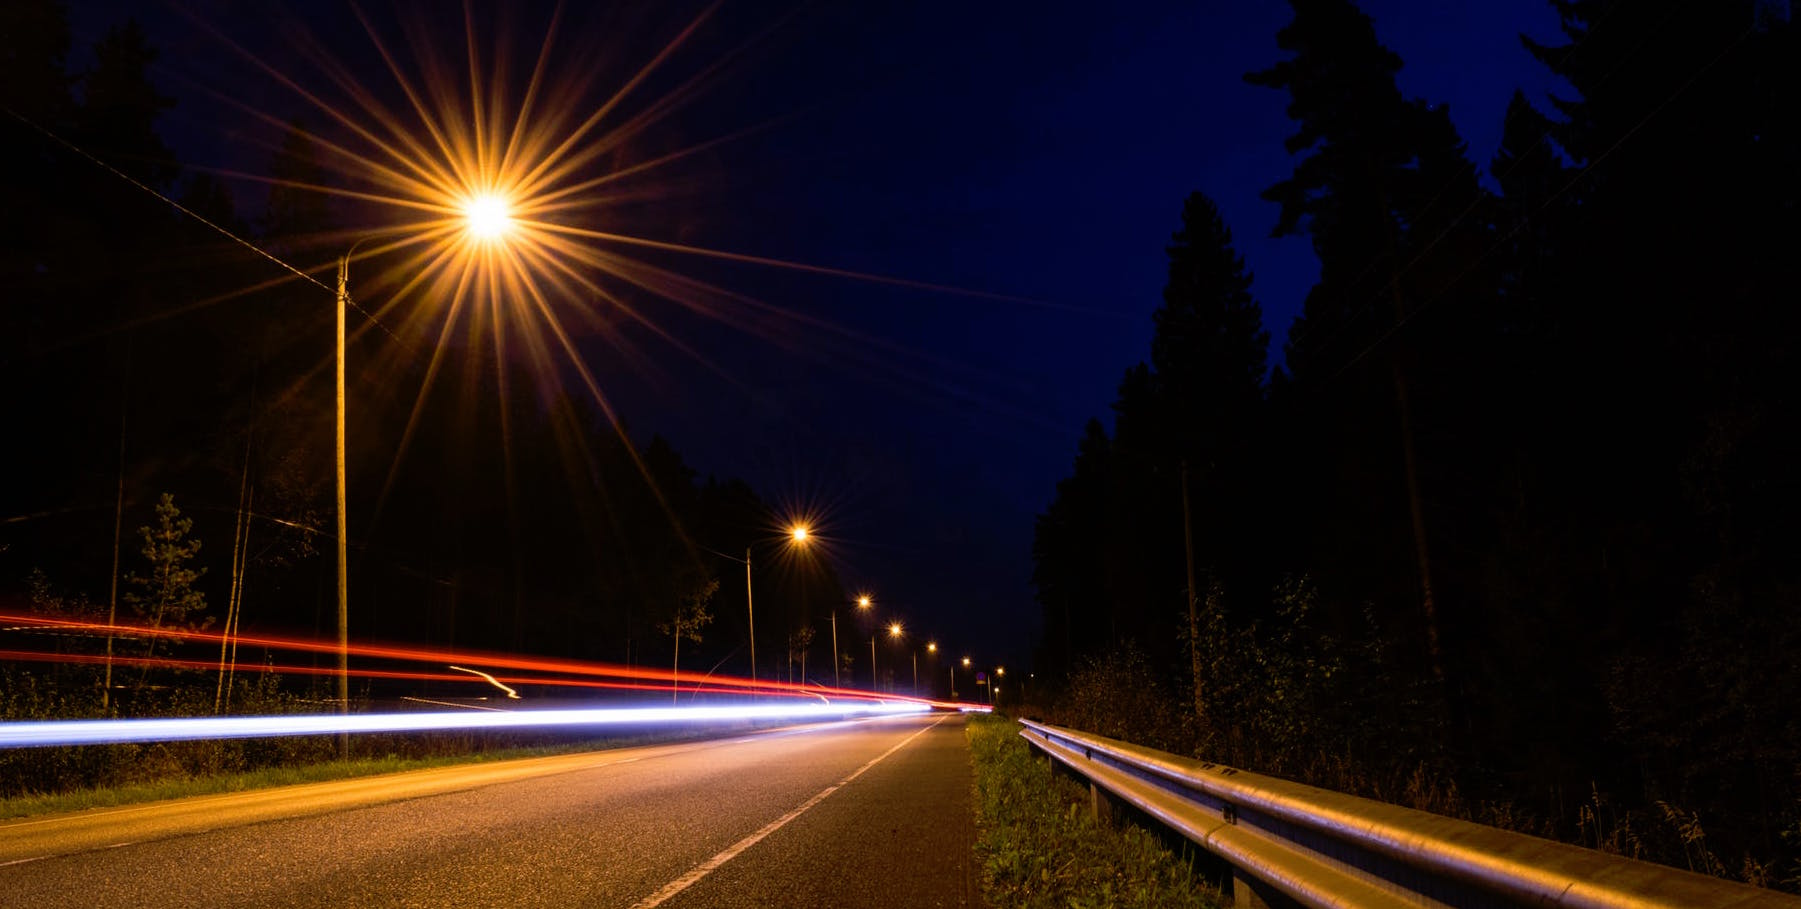 autoroute lampadaire